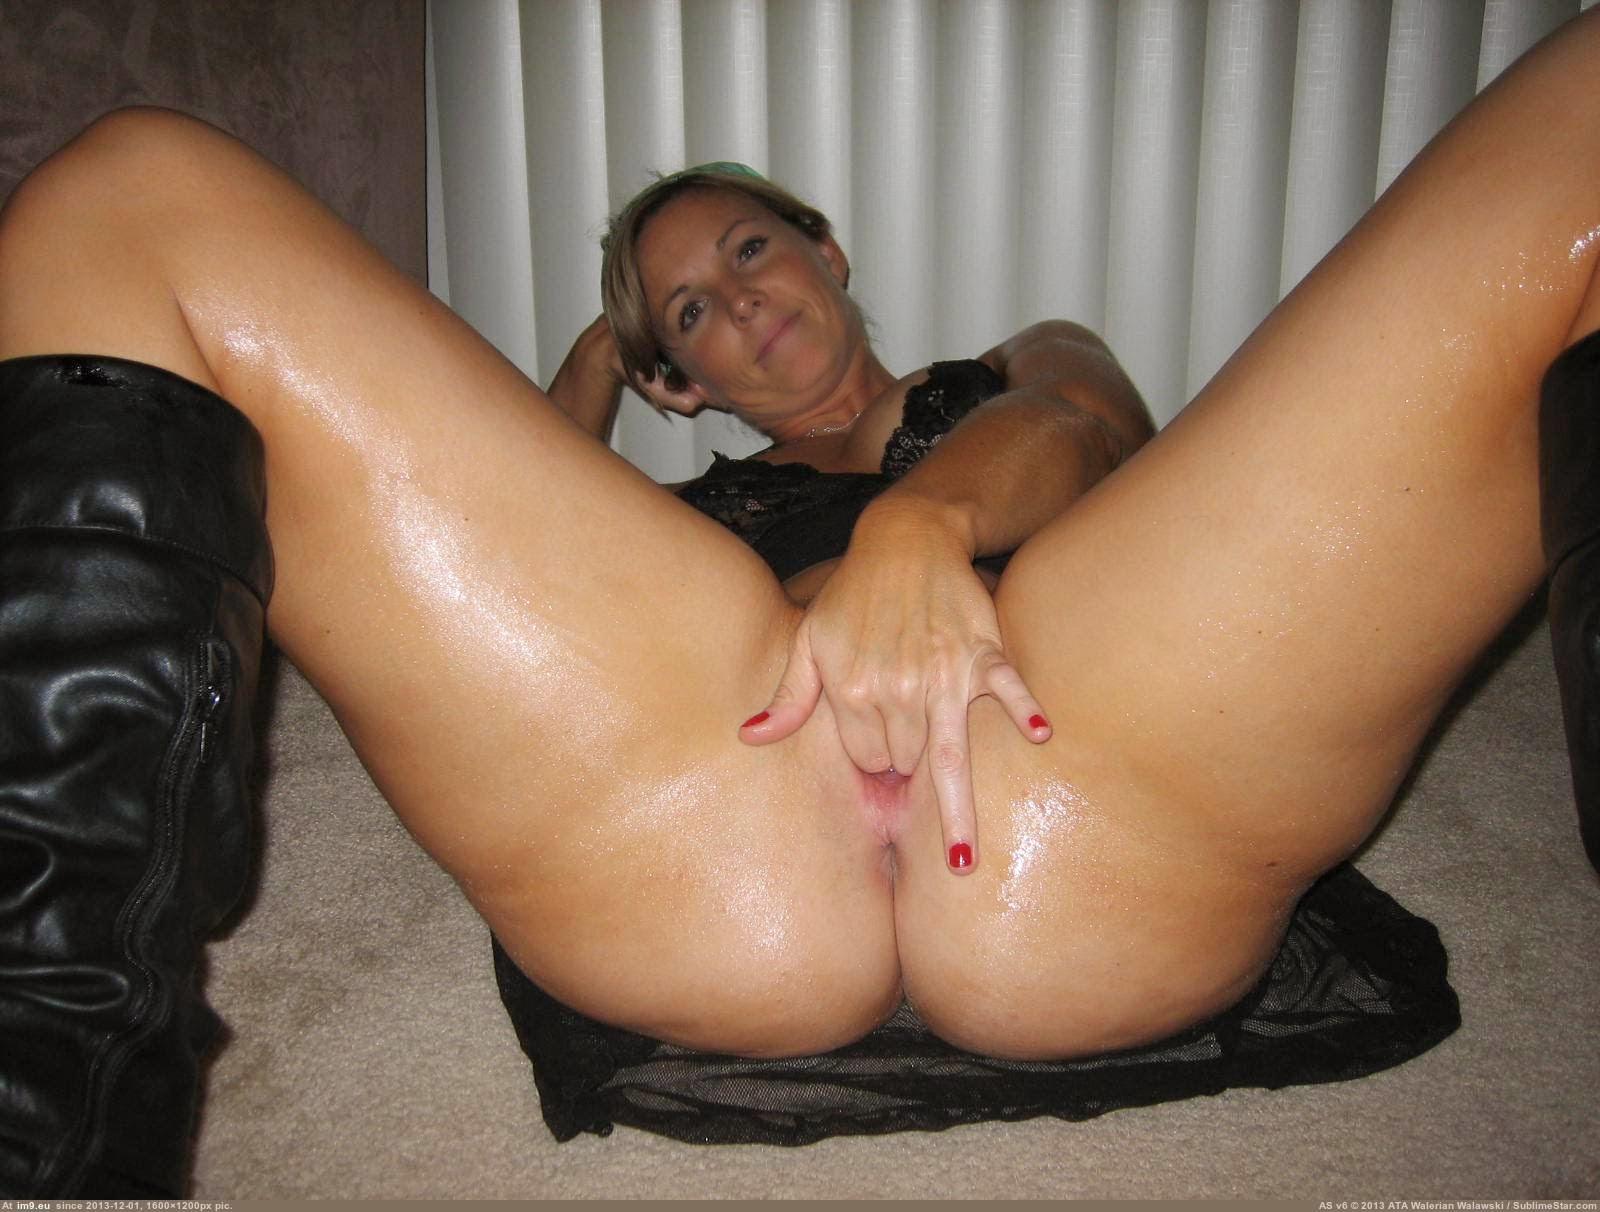 Порно зрелых мамаш за 40